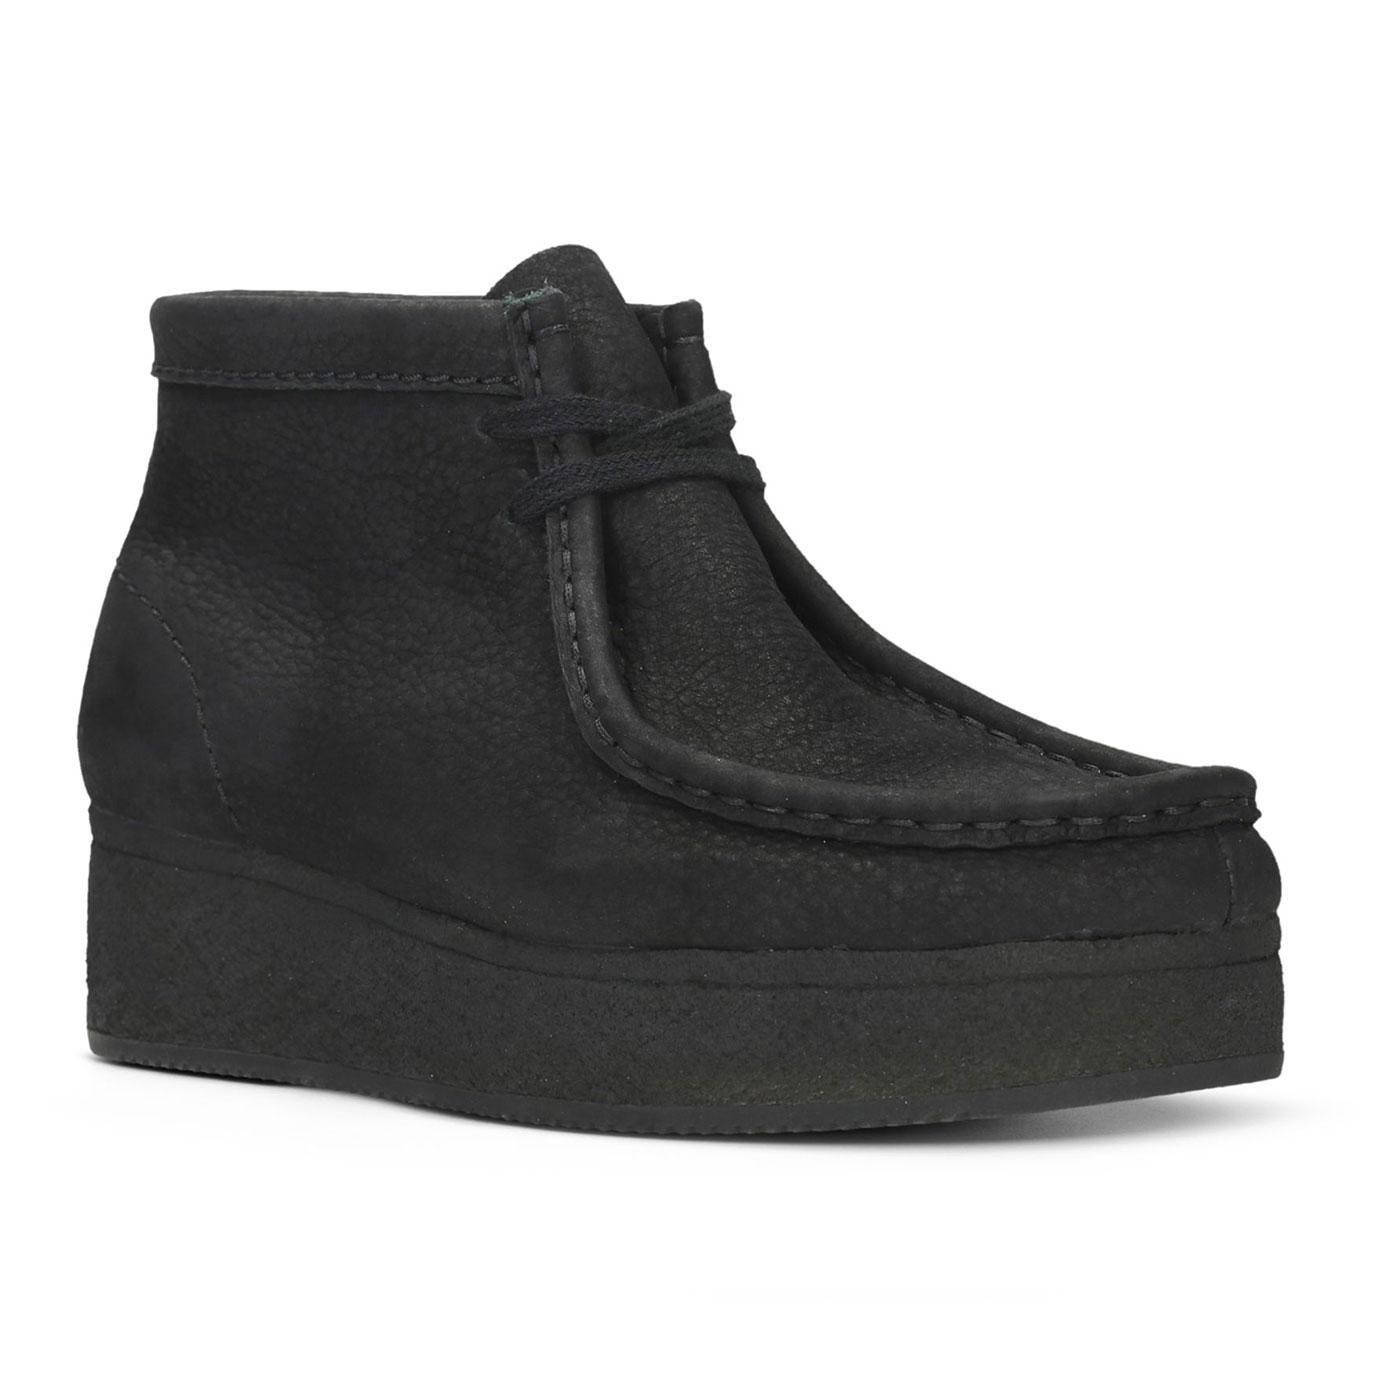 Wallabee Wedge CLARKS ORIGINALS Suede Boots BLACK